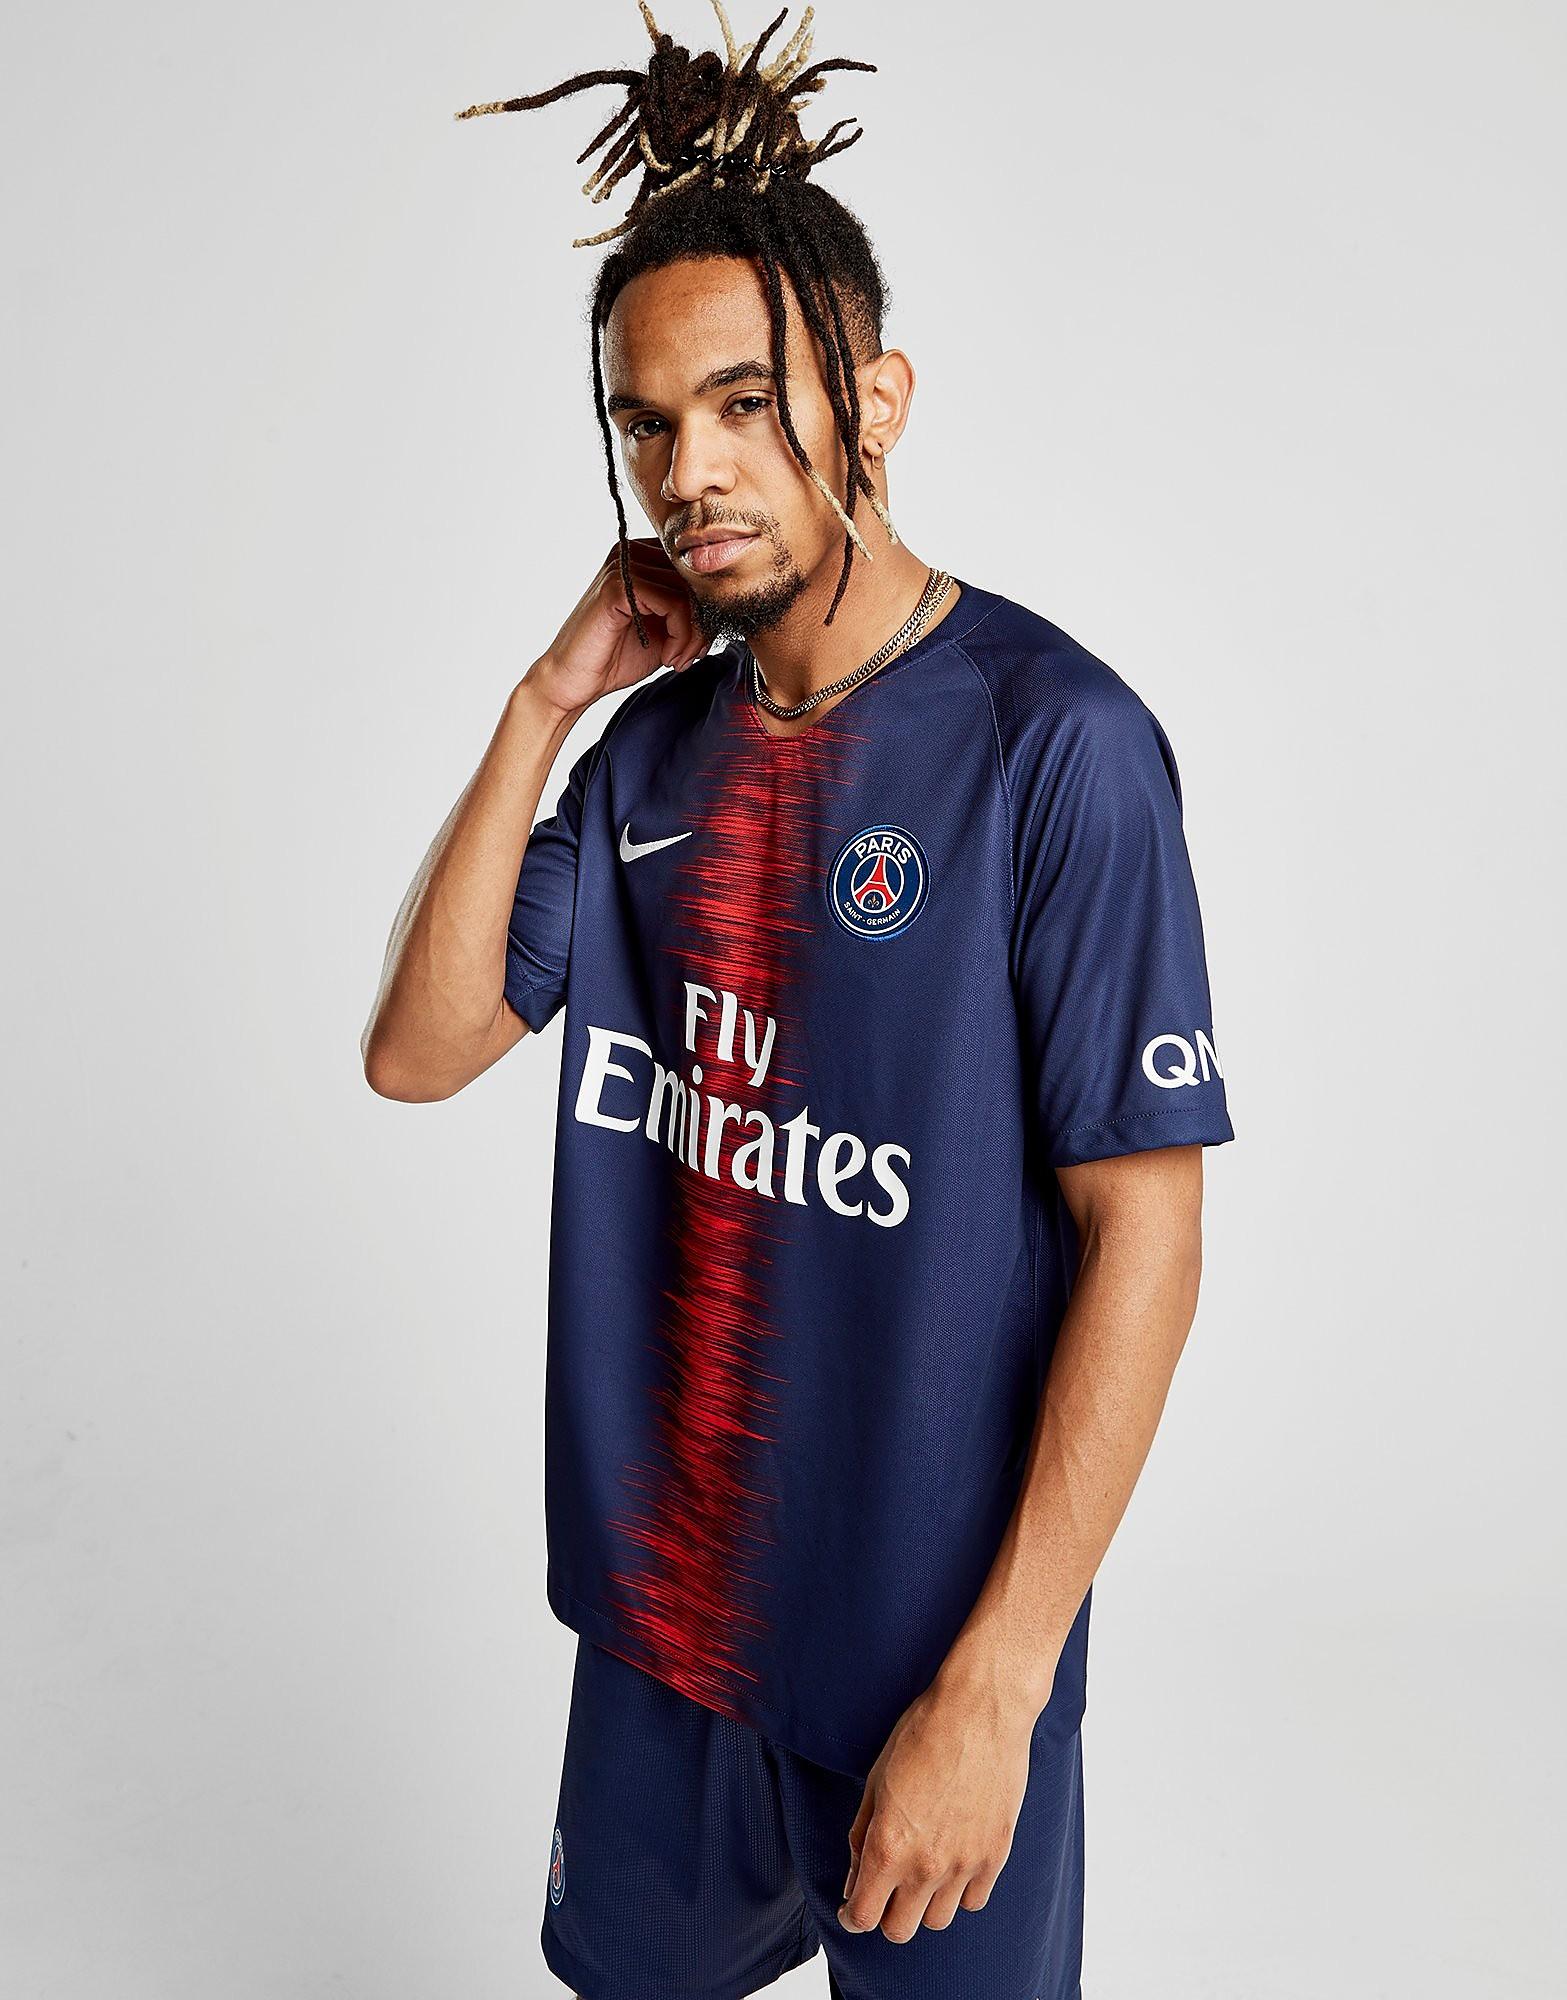 Nike camiseta 1.ª equipación Paris Saint Germain 2018/19